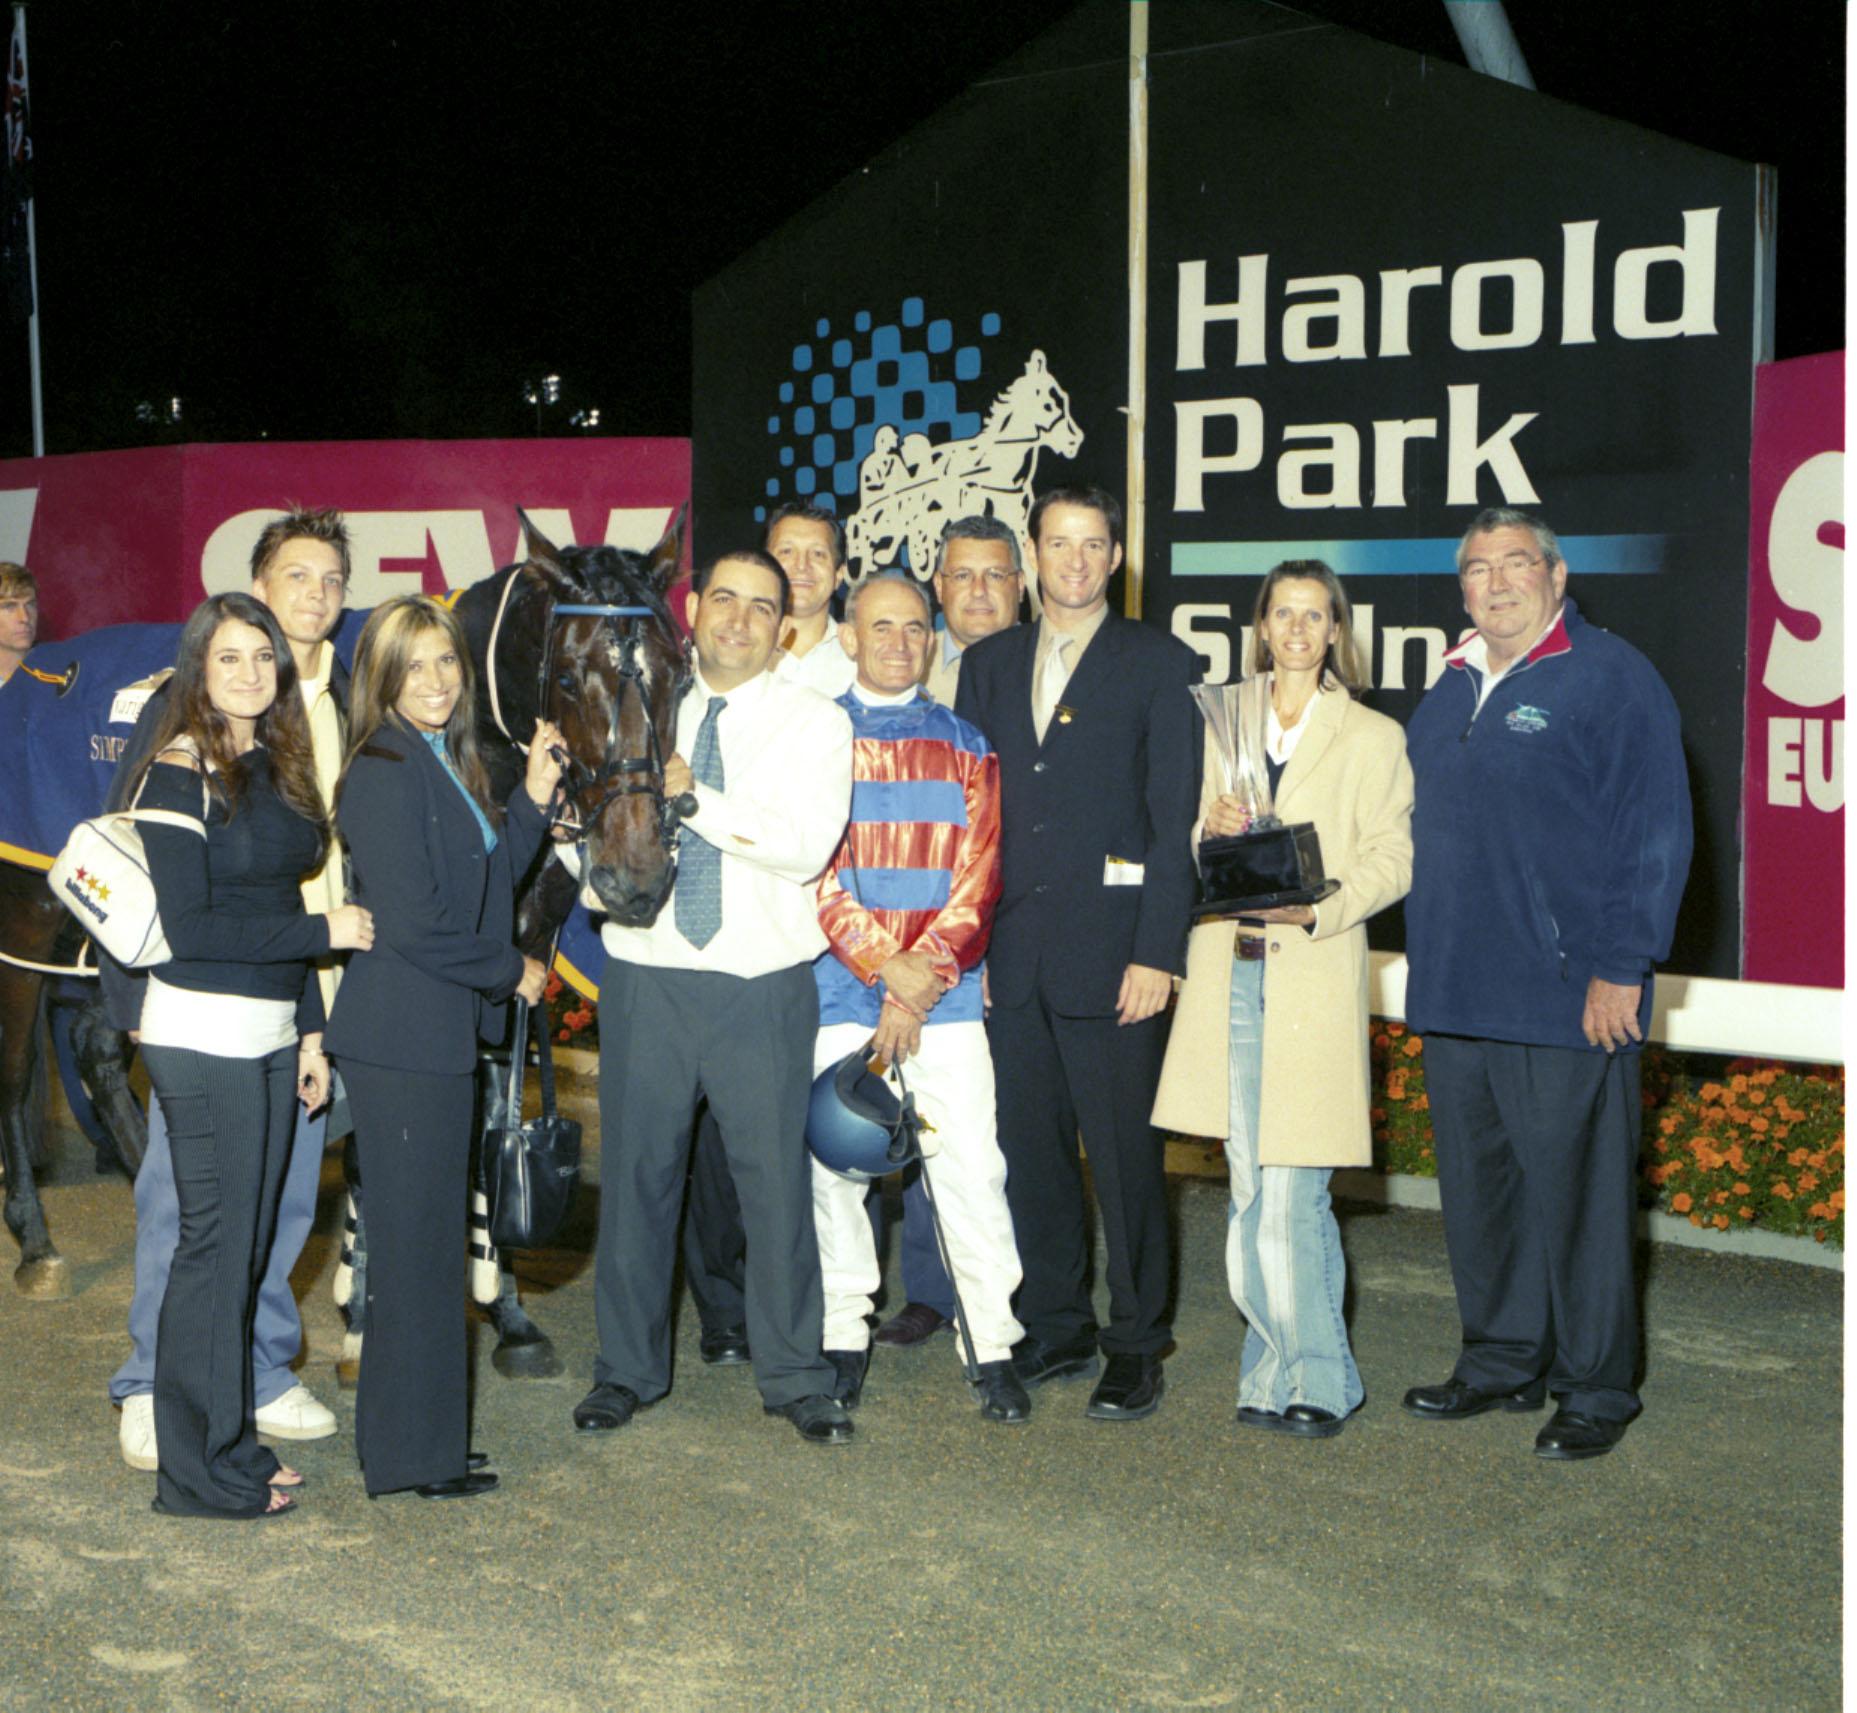 Image courtesy of Harness Racing NSW - Joe, Mary and Amanda at the presentation after Howard Ino's Simpson Sprint win